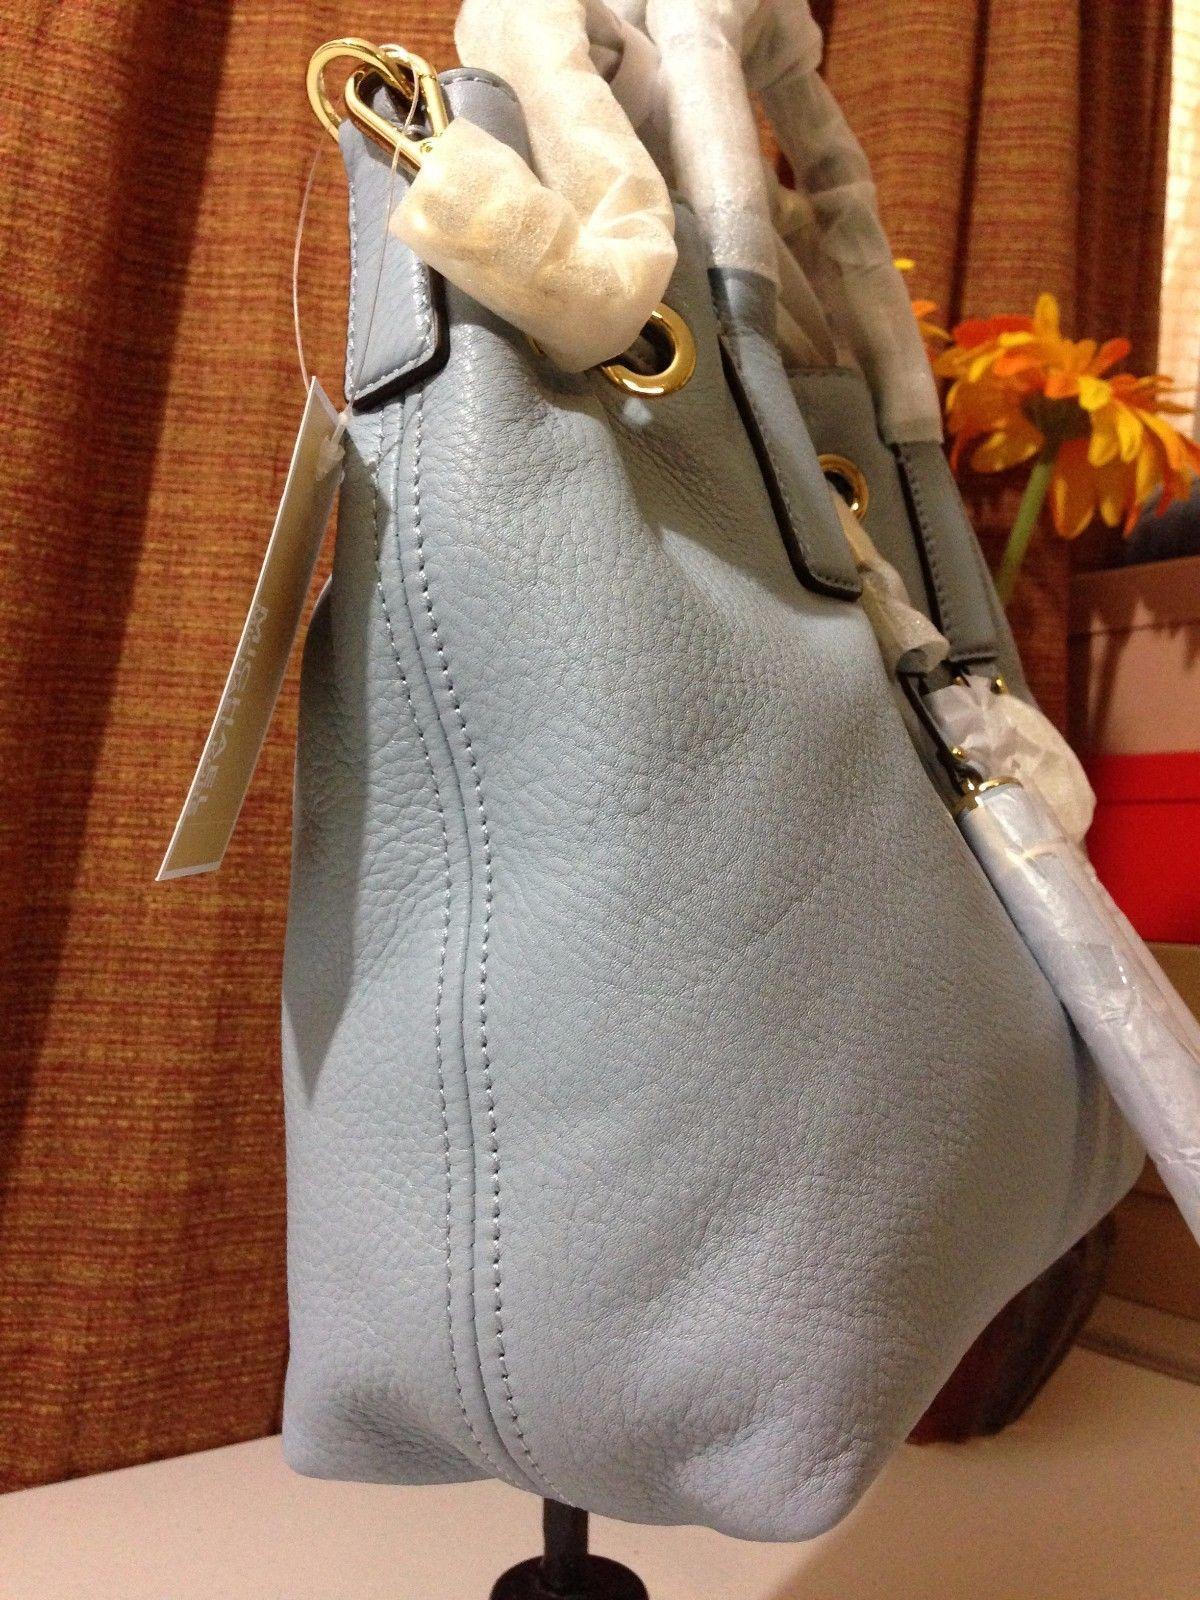 NWT MICHAEL MICHAEL KORS Camden Medium Leather Drawstring Satchel Pale Blue $358